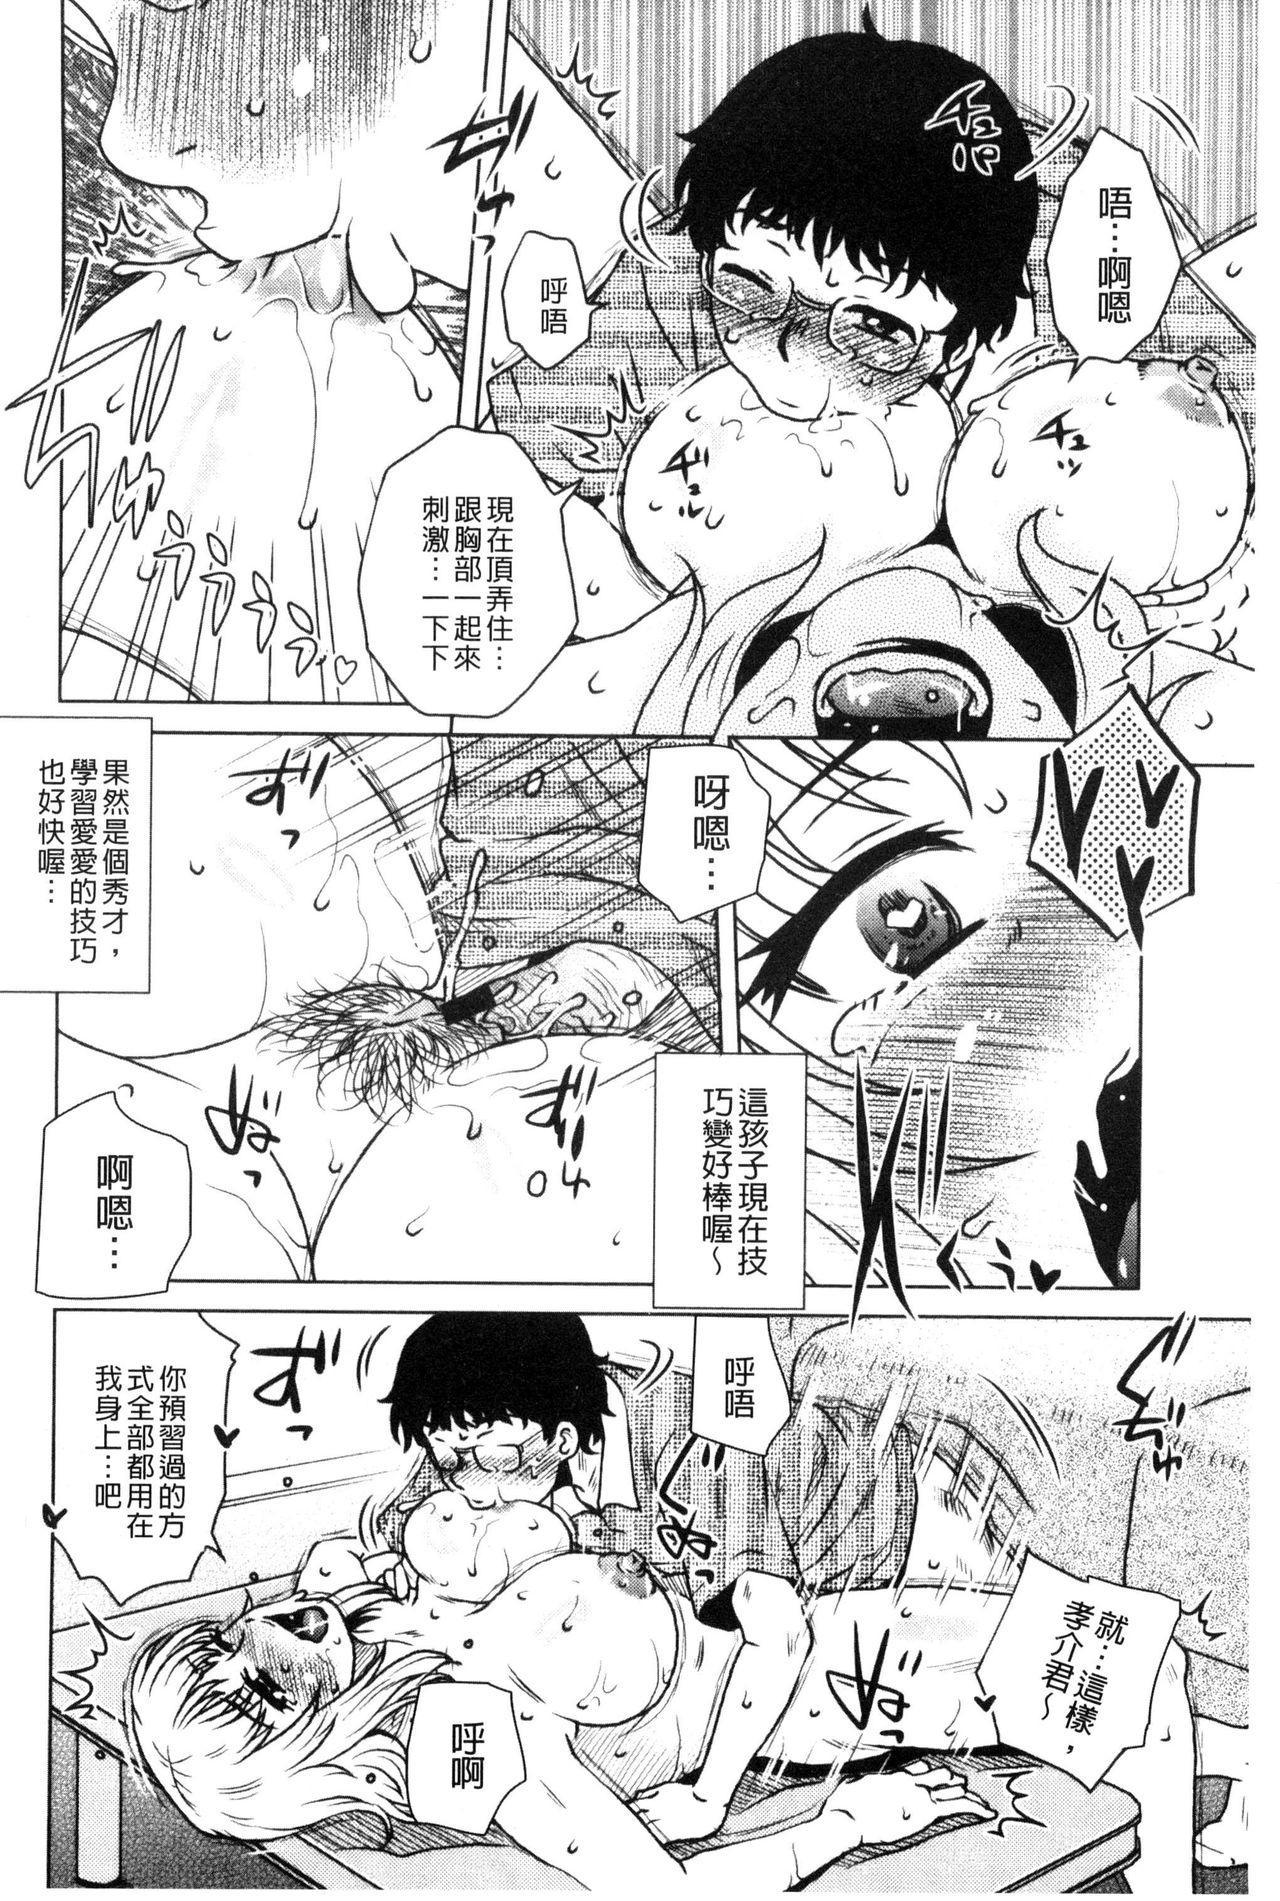 [Kurumiya Mashimin] Uchi no Shachou no Hamedere Inkatsu - Our President is HAME-DERE in Licentious sex life. [Chinese] 162